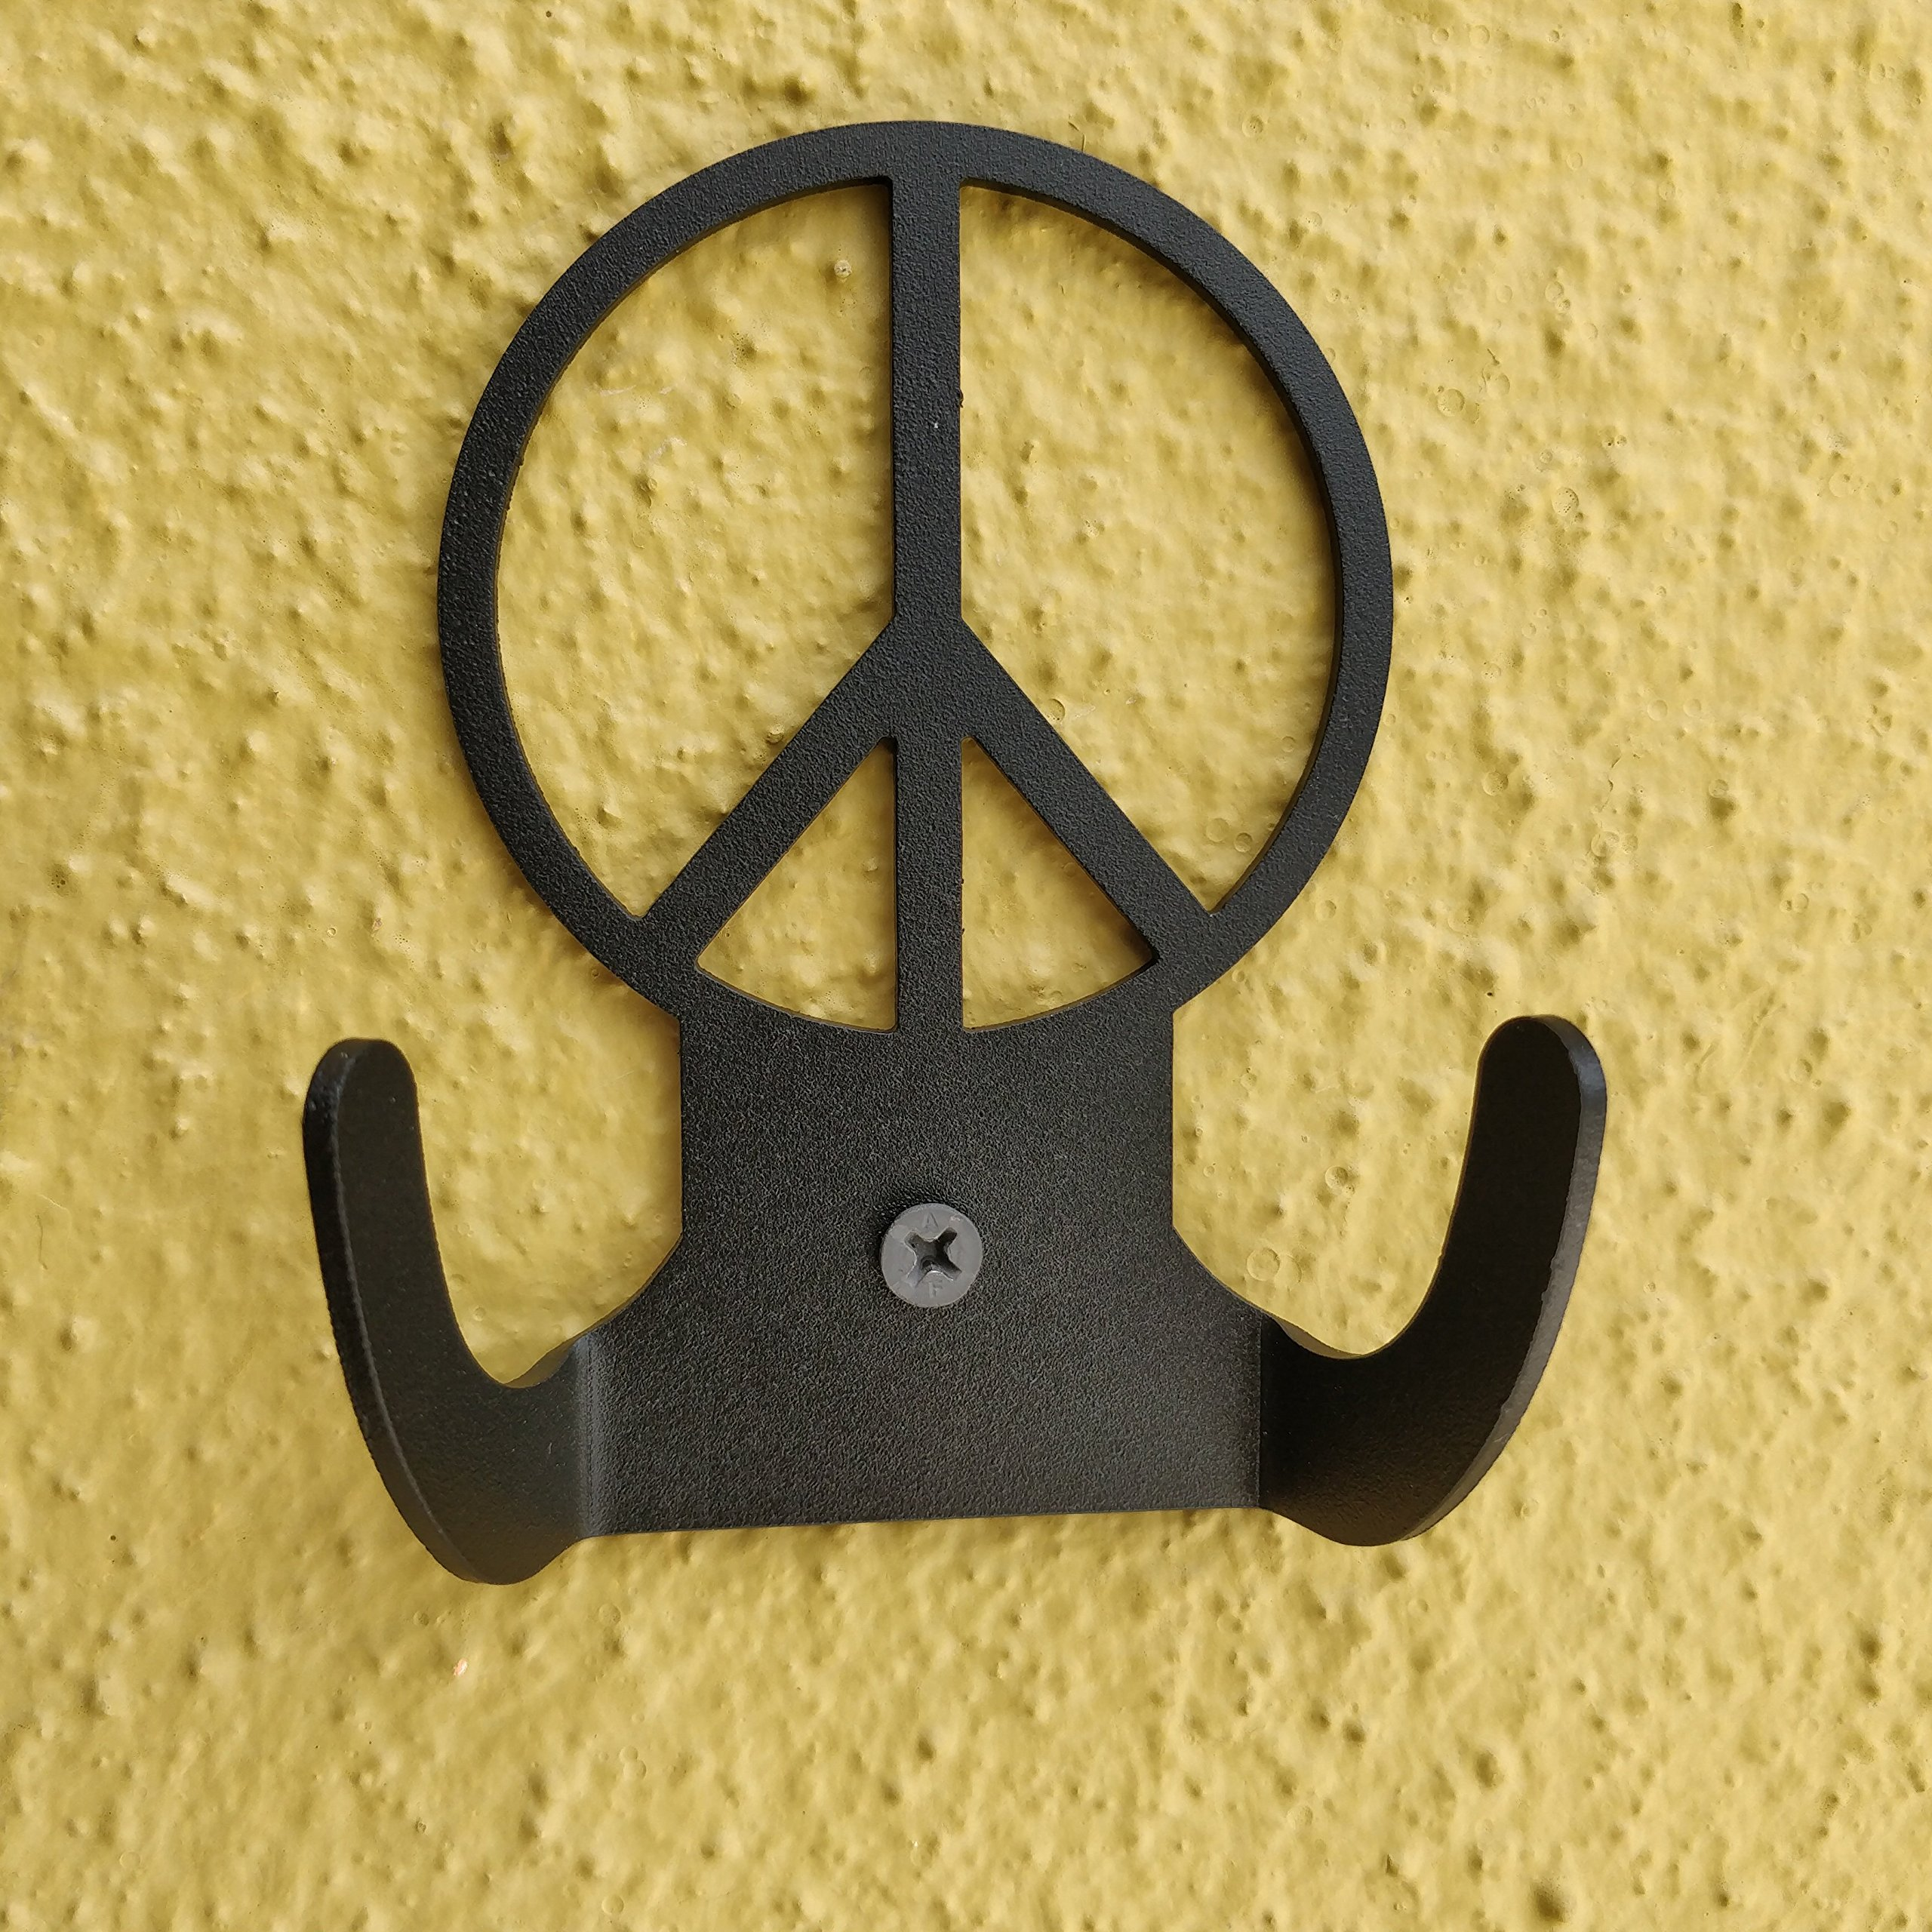 HeavenlyKraft Peacelogo Steel Wall Hook Dual Holder for Living Room Coat Hat Robe Hanger Bathroom Towel Kitchen Strong Heavy Duty Garage Storage Organizer Utensil Hook Single, 4 X 3.14 X 1.4 Inch by HeavenlyKraft (Image #1)